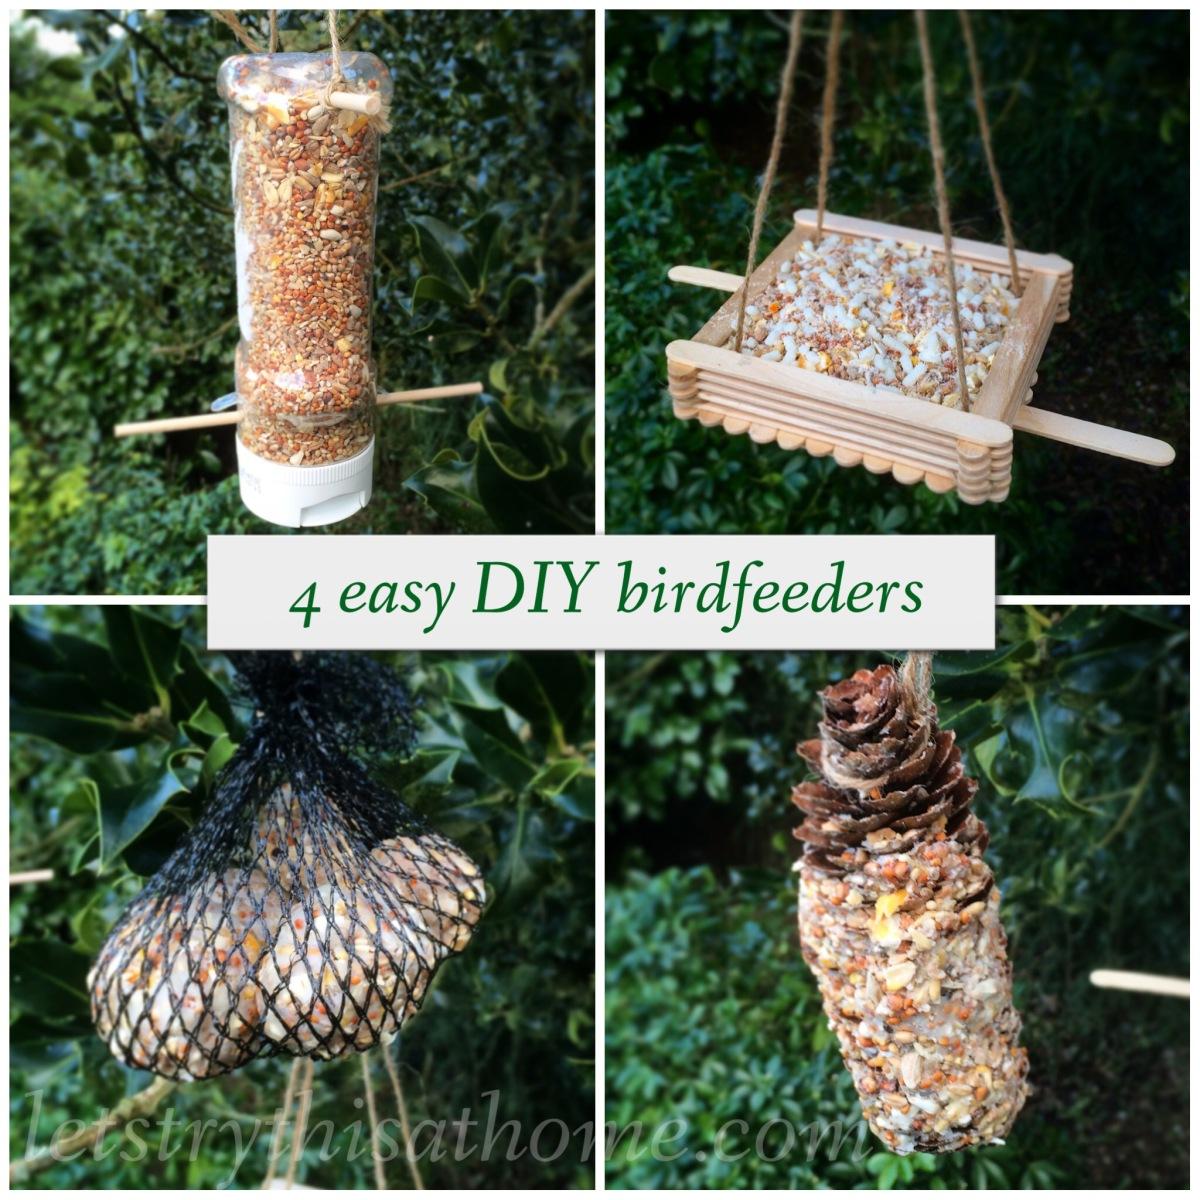 Four Easy Diy Bird Feeders Letstrythisathome